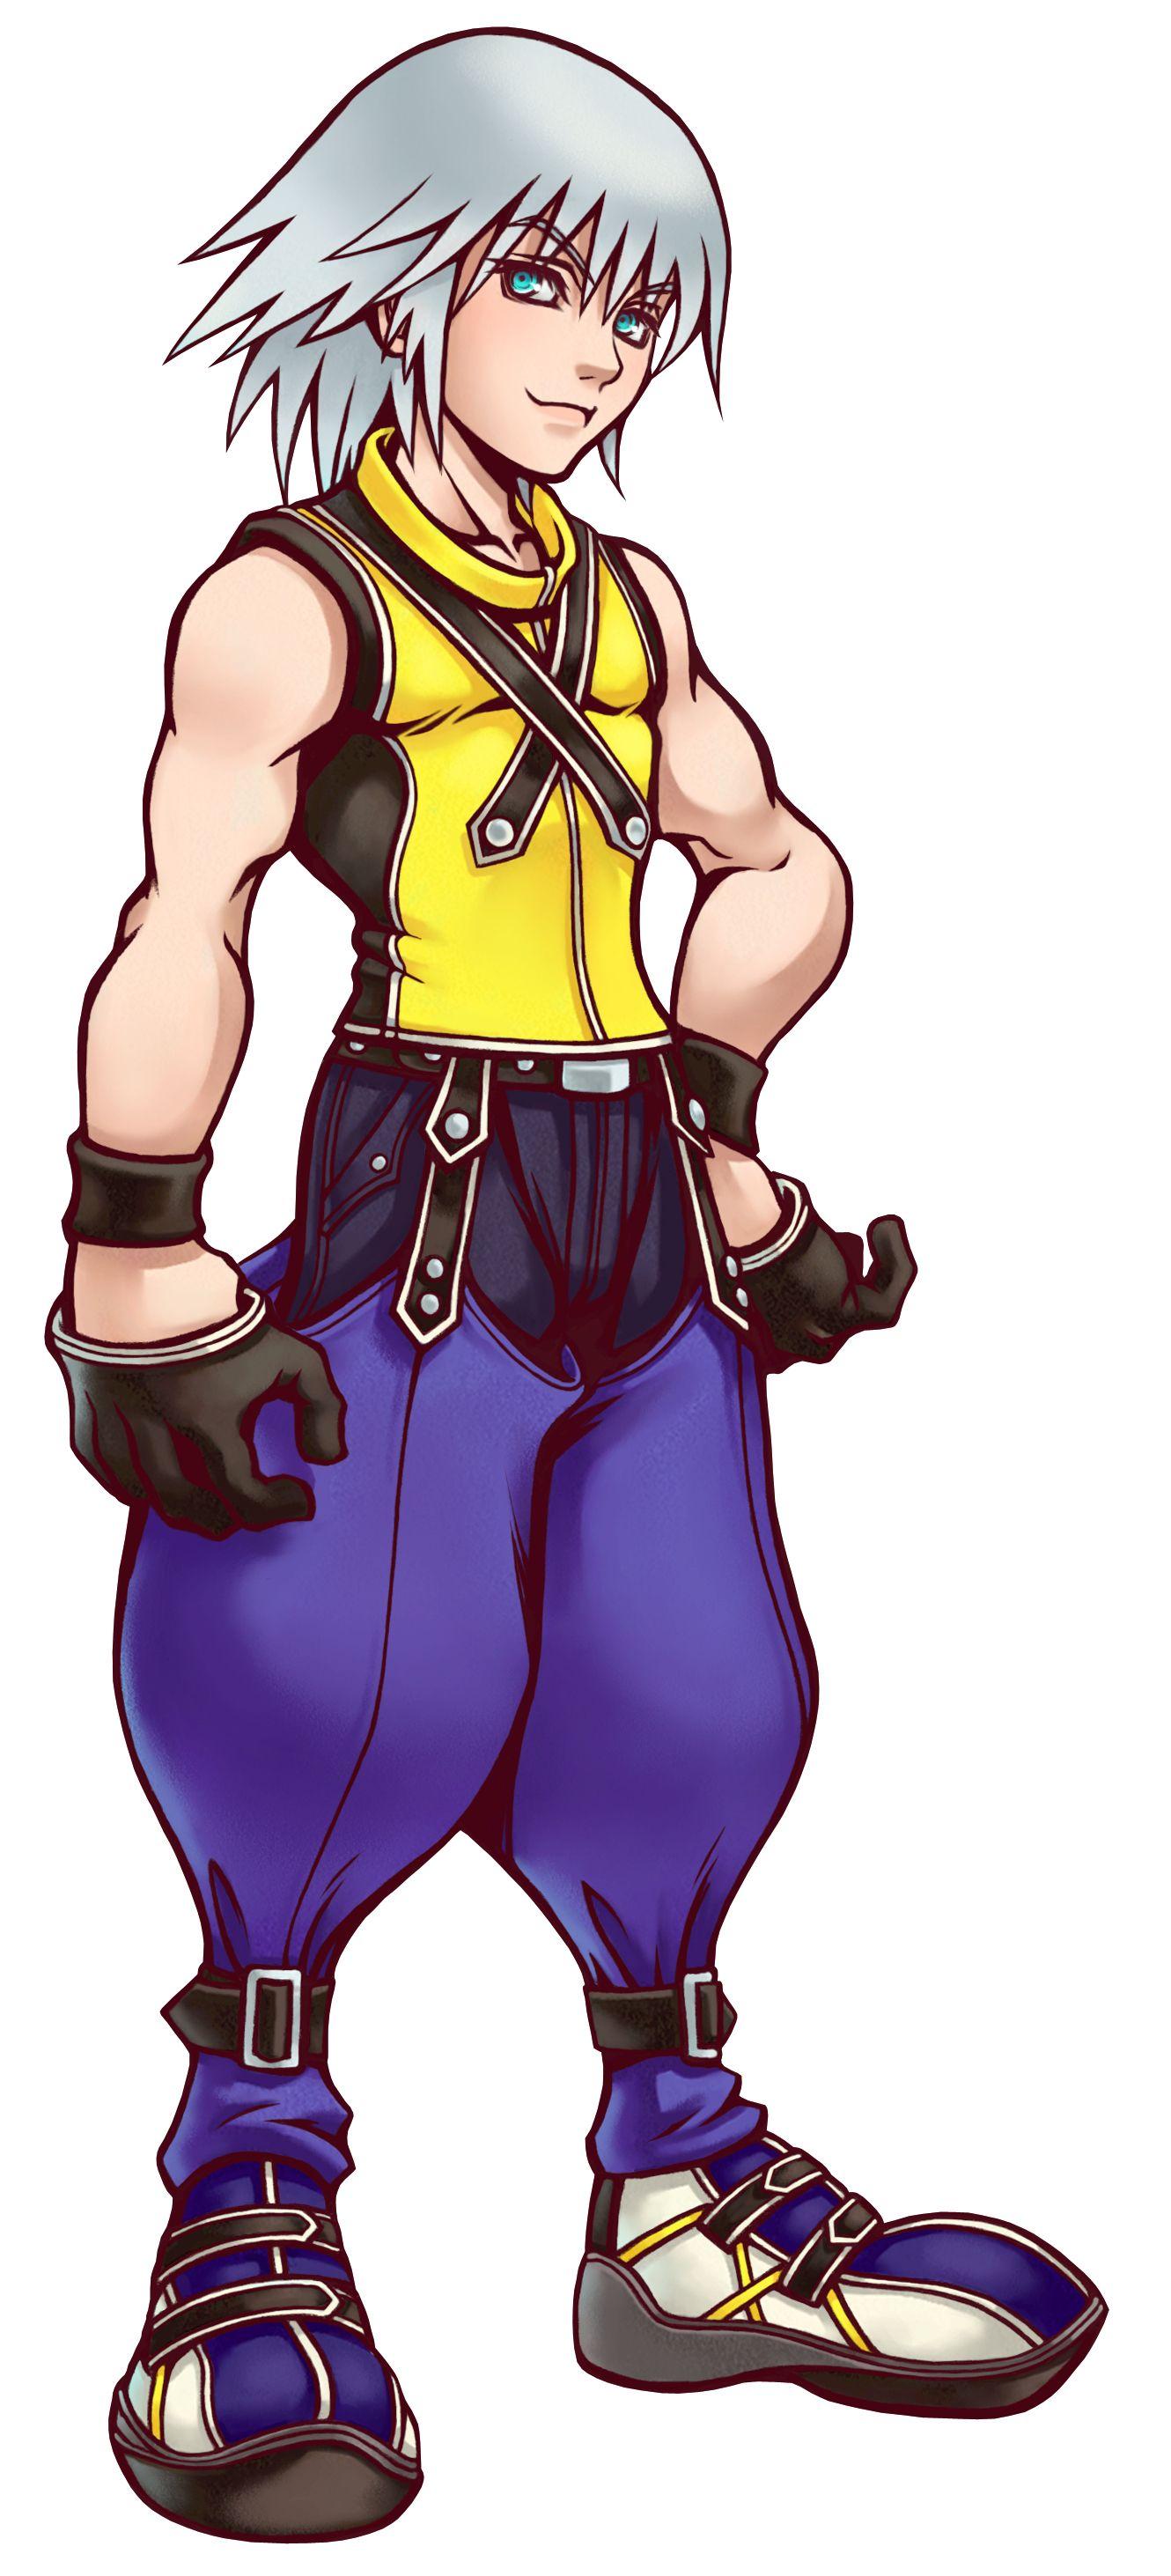 Image From Http Img4 Wikia Nocookie Net Cb20140613200329 Disney Images D D4 Riku Kh Artwork Png Riku Kingdom Hearts Kingdom Hearts Kingdom Hearts Art